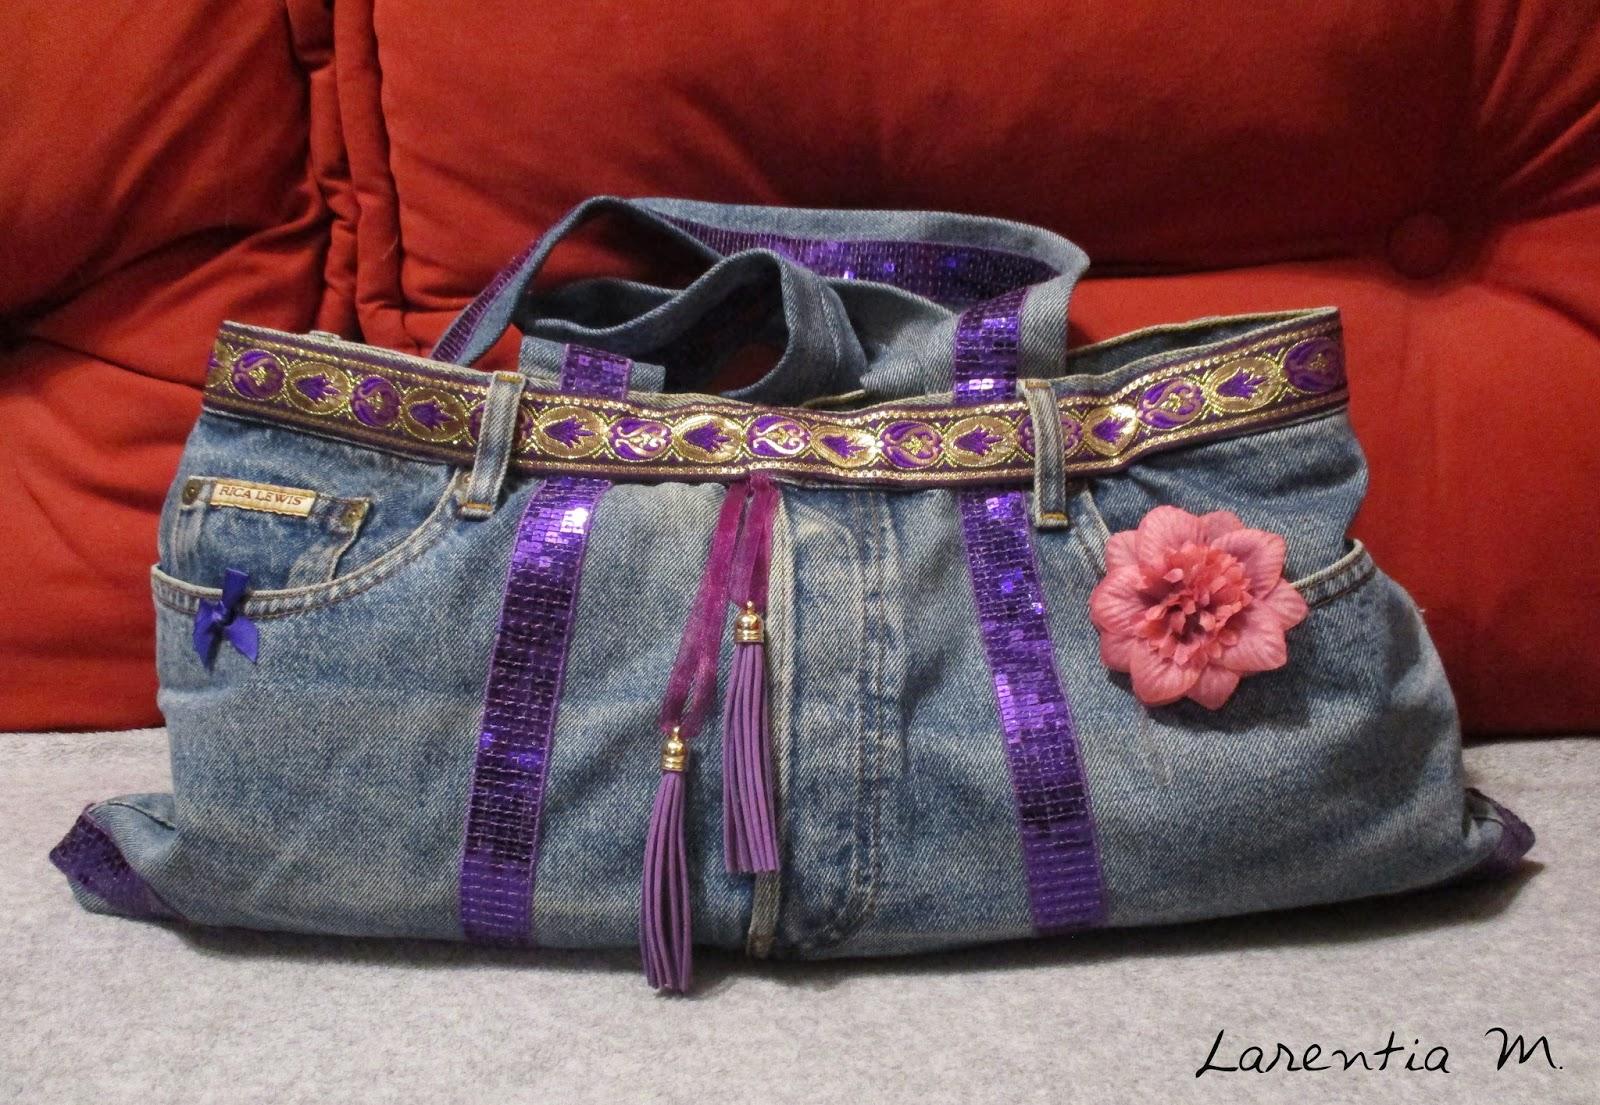 larentia m transformer un jean en sac main. Black Bedroom Furniture Sets. Home Design Ideas